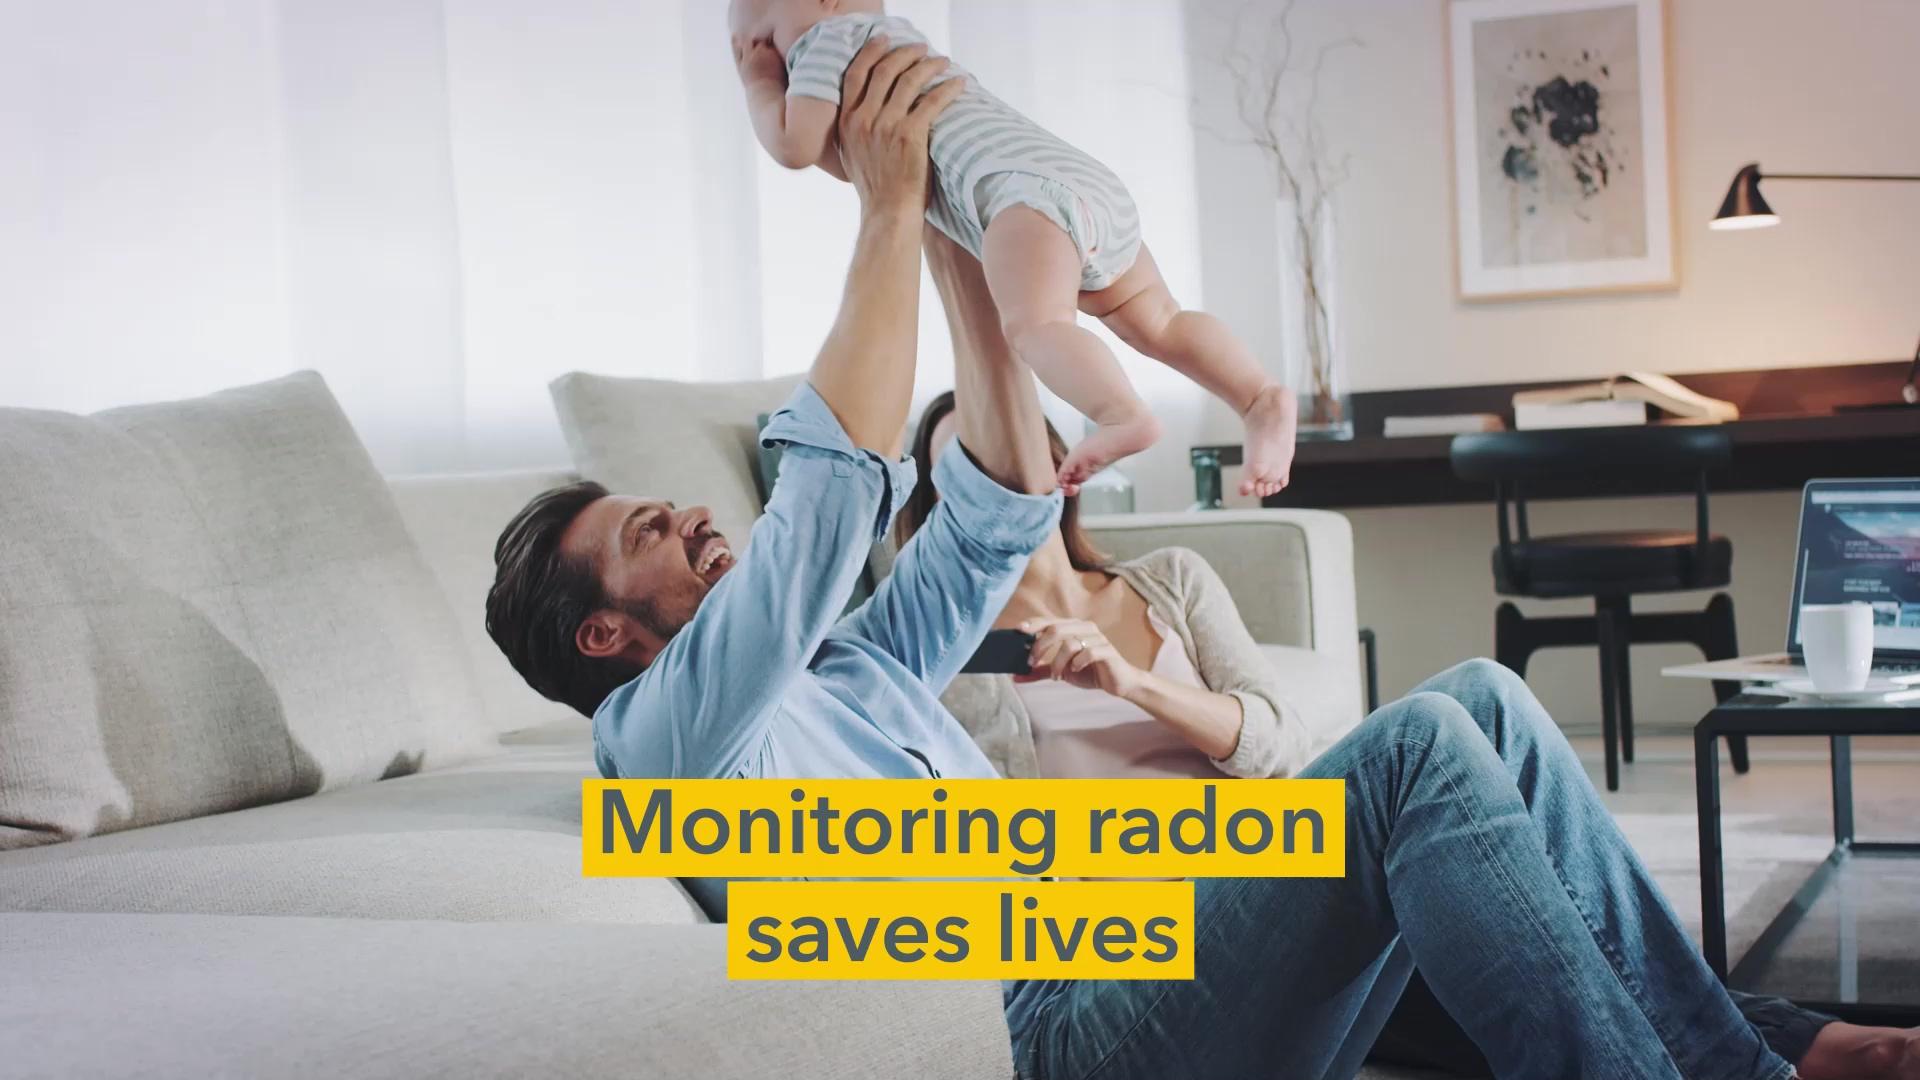 airthings-radon-campaign-30s-EN-052021